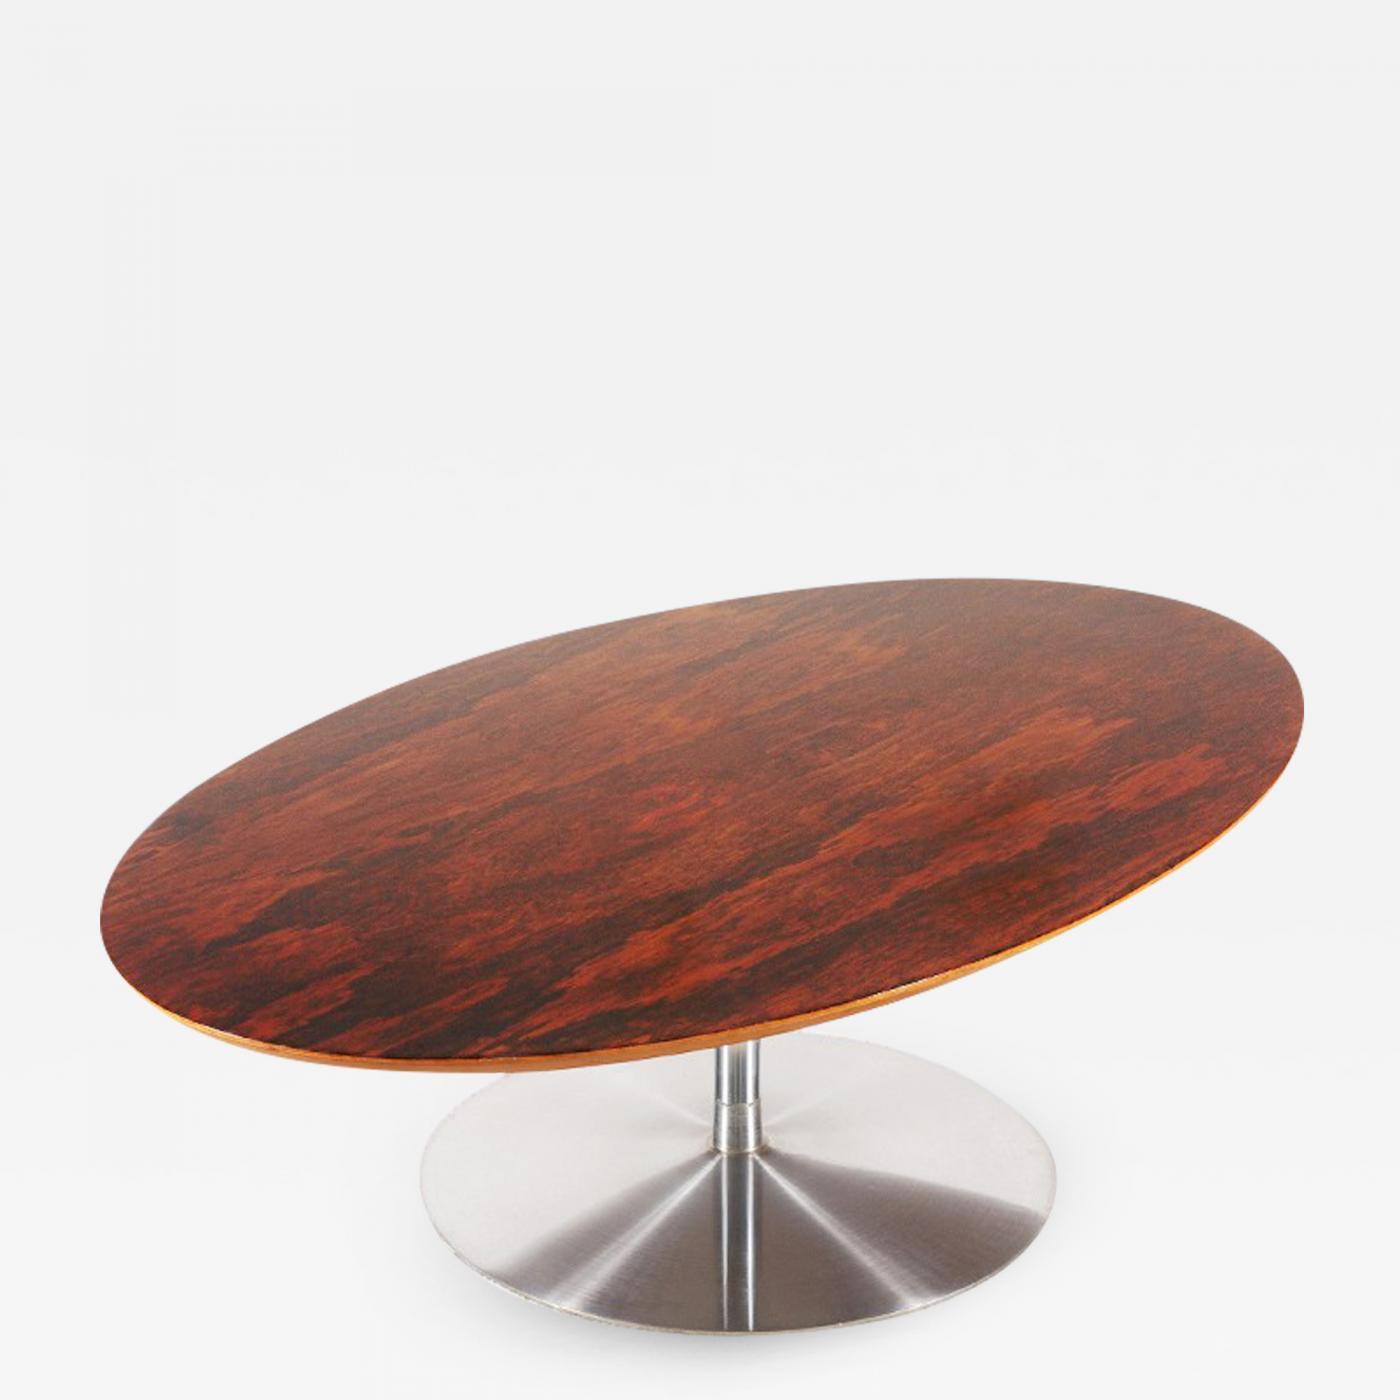 Fine Pierre Paulin Rare Pierre Paulin Rosewood Coffee Table For Artifort 1960S Inzonedesignstudio Interior Chair Design Inzonedesignstudiocom